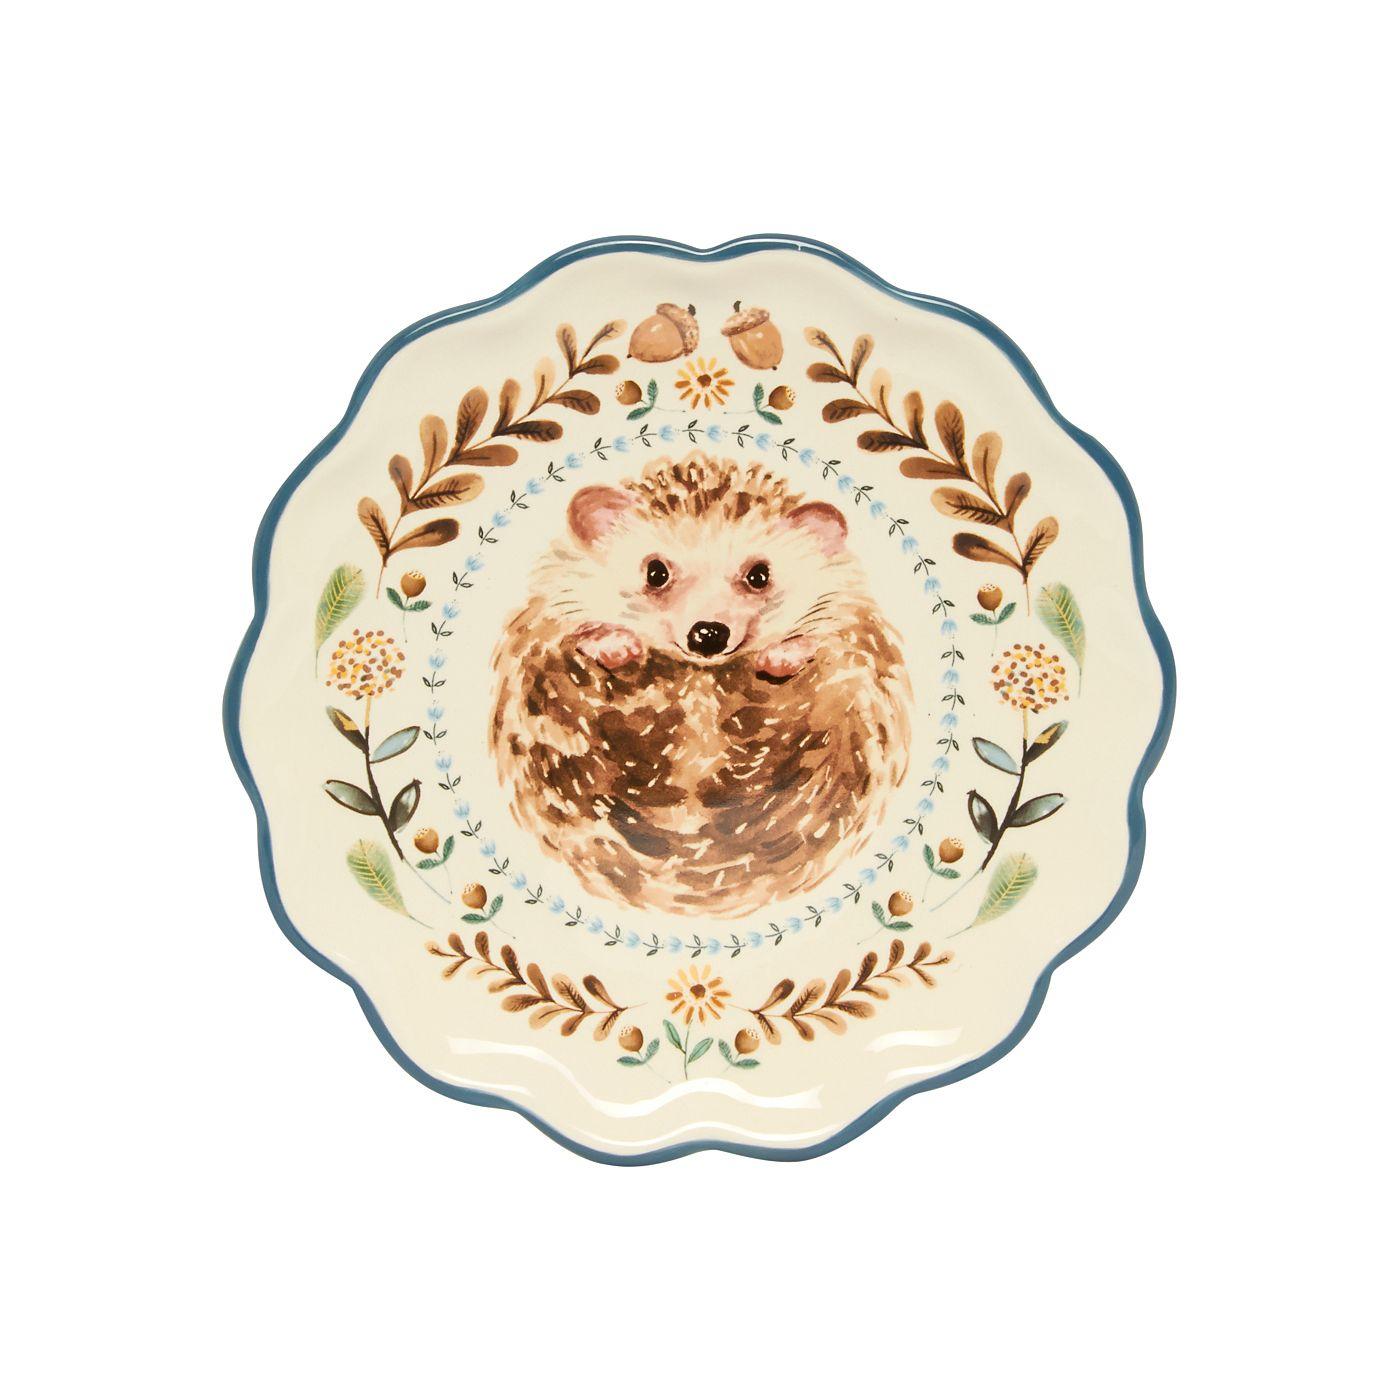 George Home Hedgehog Plate Ornaments Asda Direct George Home Hedgehog Fall Decor